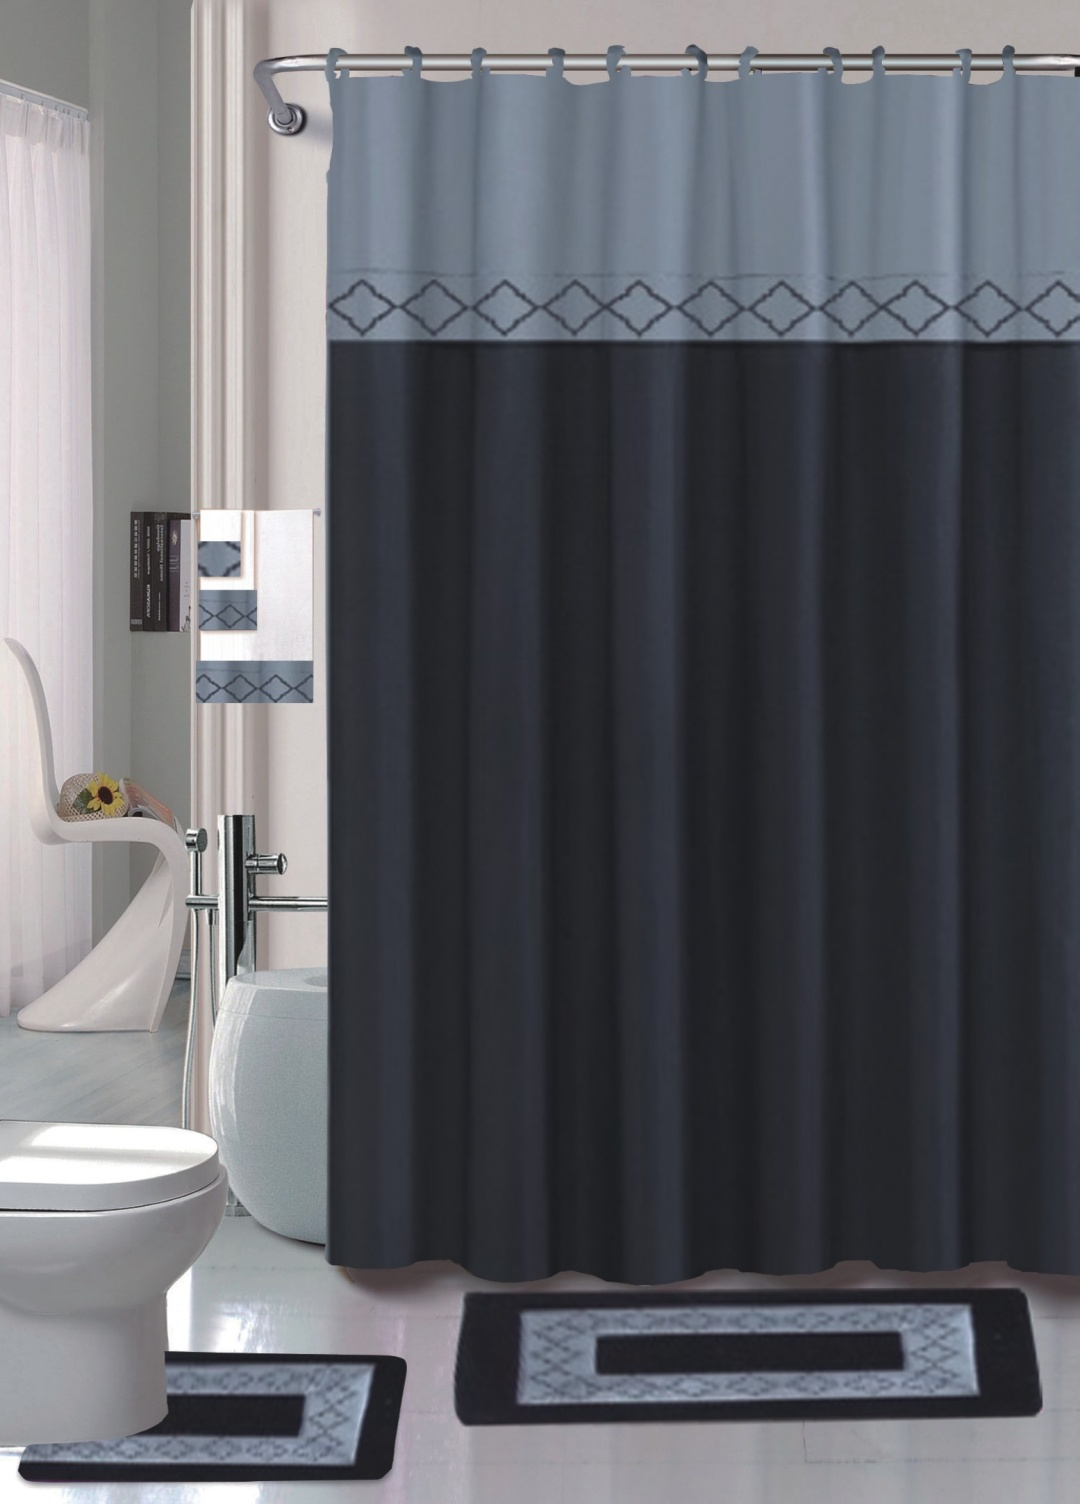 black kadir 15 piece hotel bathroom sets 2 non slip bath mats rugs fabric shower curtain 12 hooks